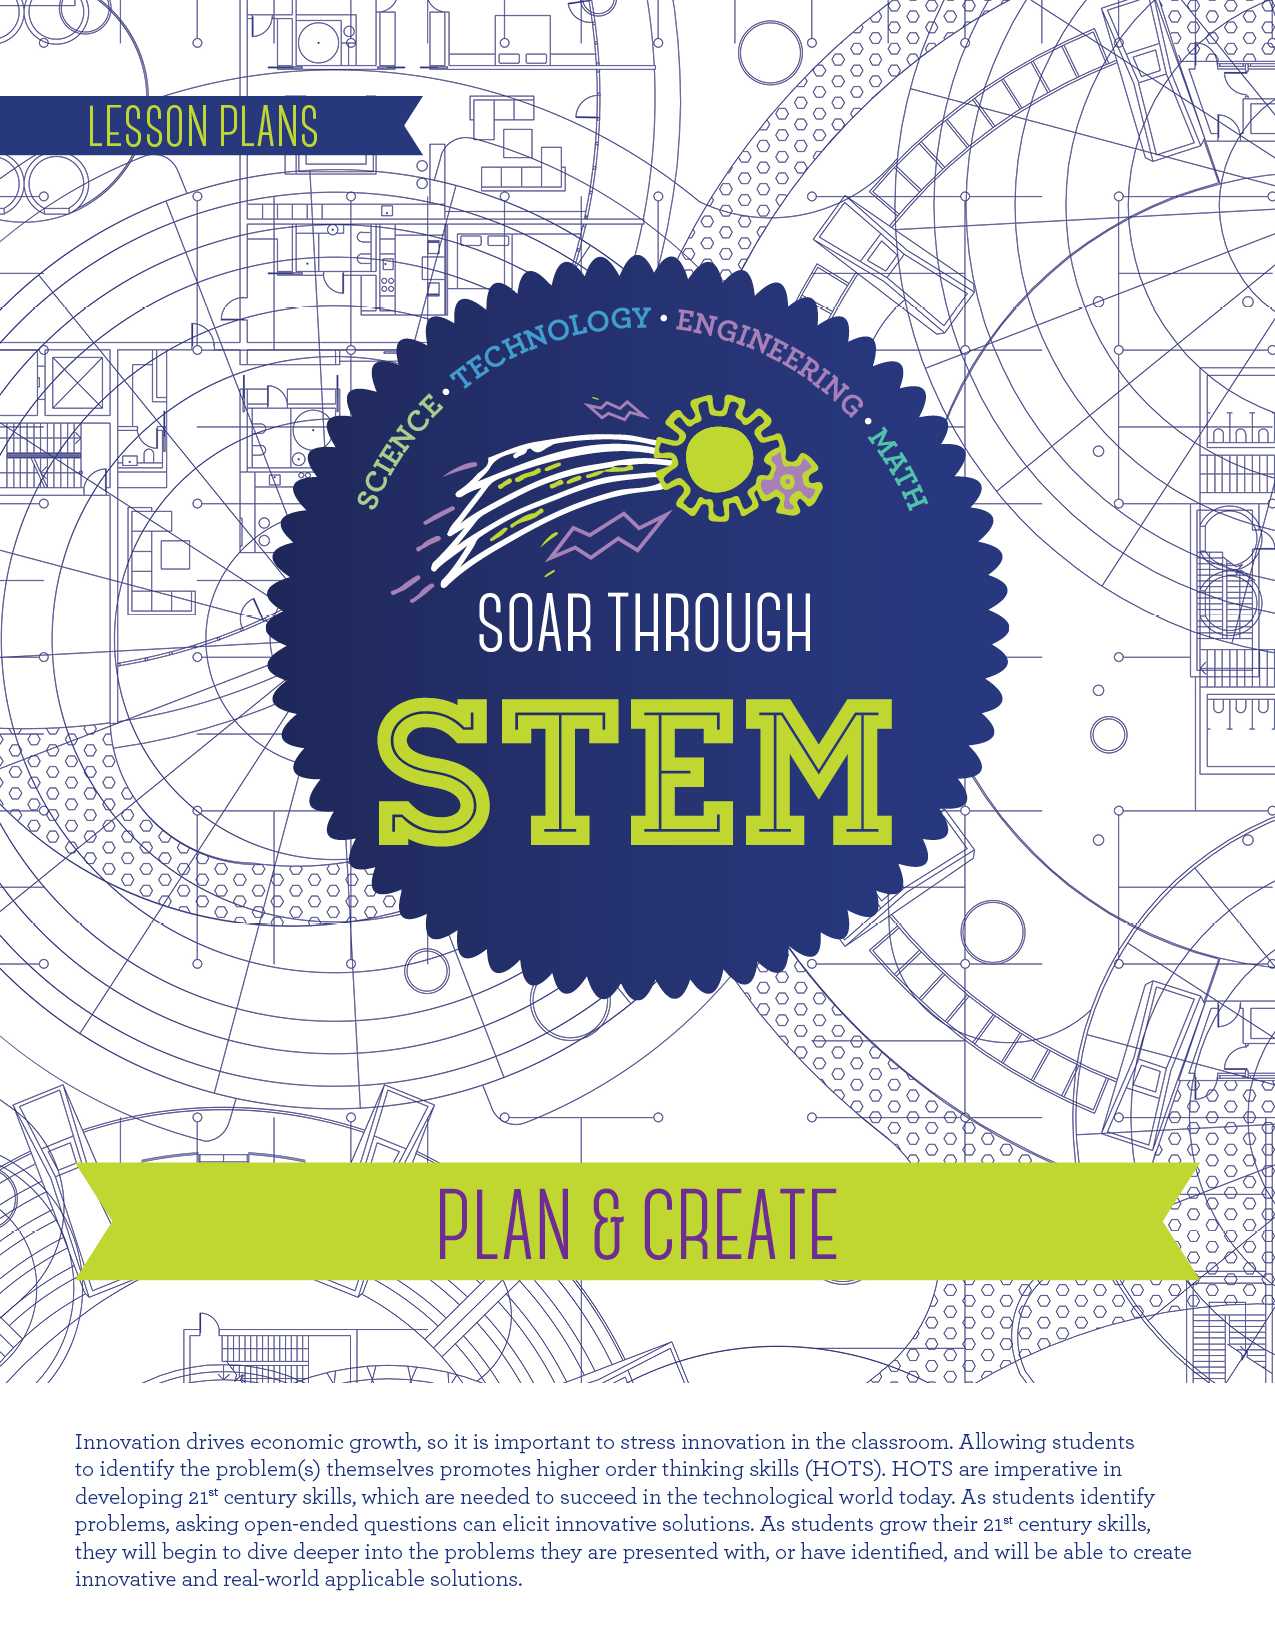 Lesson Plan Engineering Design Process Plan Create Soar Through Stem